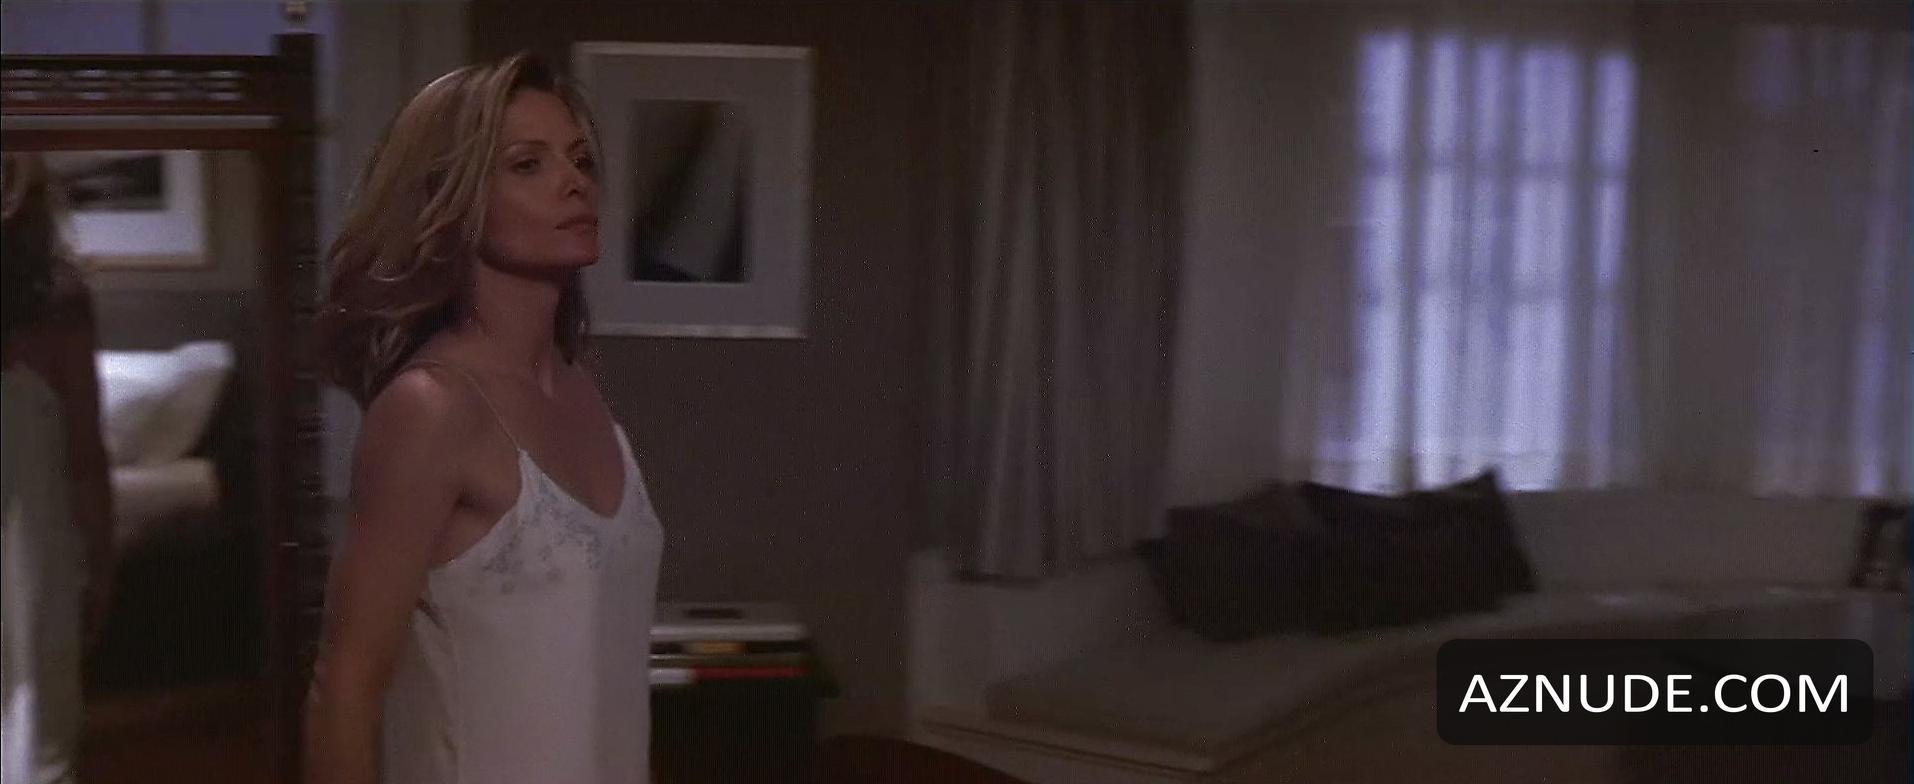 Michelle pfeiffer sex tape